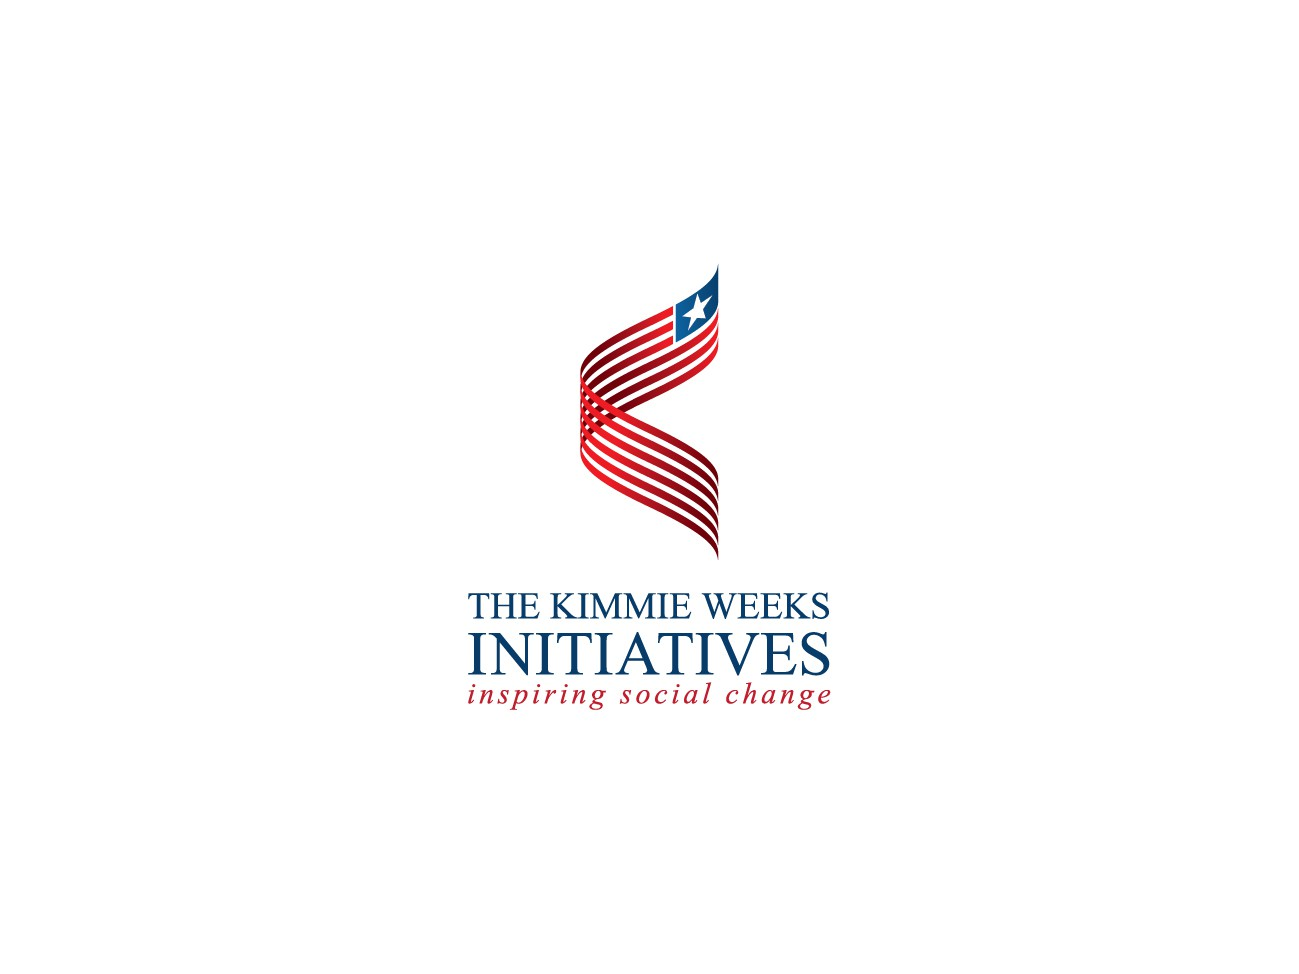 KLW Initiatives